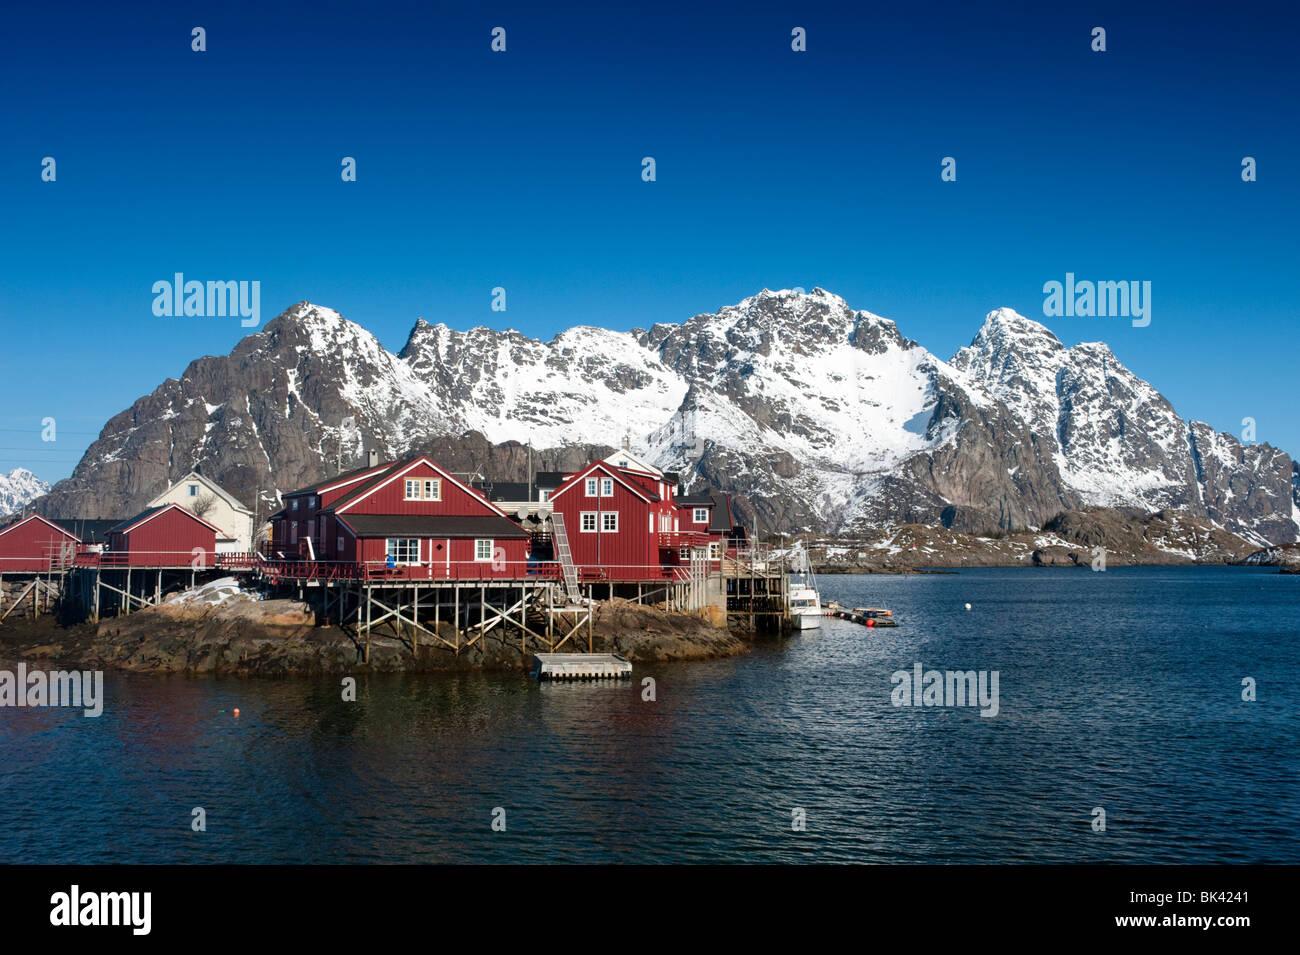 En bois rouge traditionnelle Rorbu Fishermens' huts dans village de Henningsvær en îles Lofoten en Photo Stock